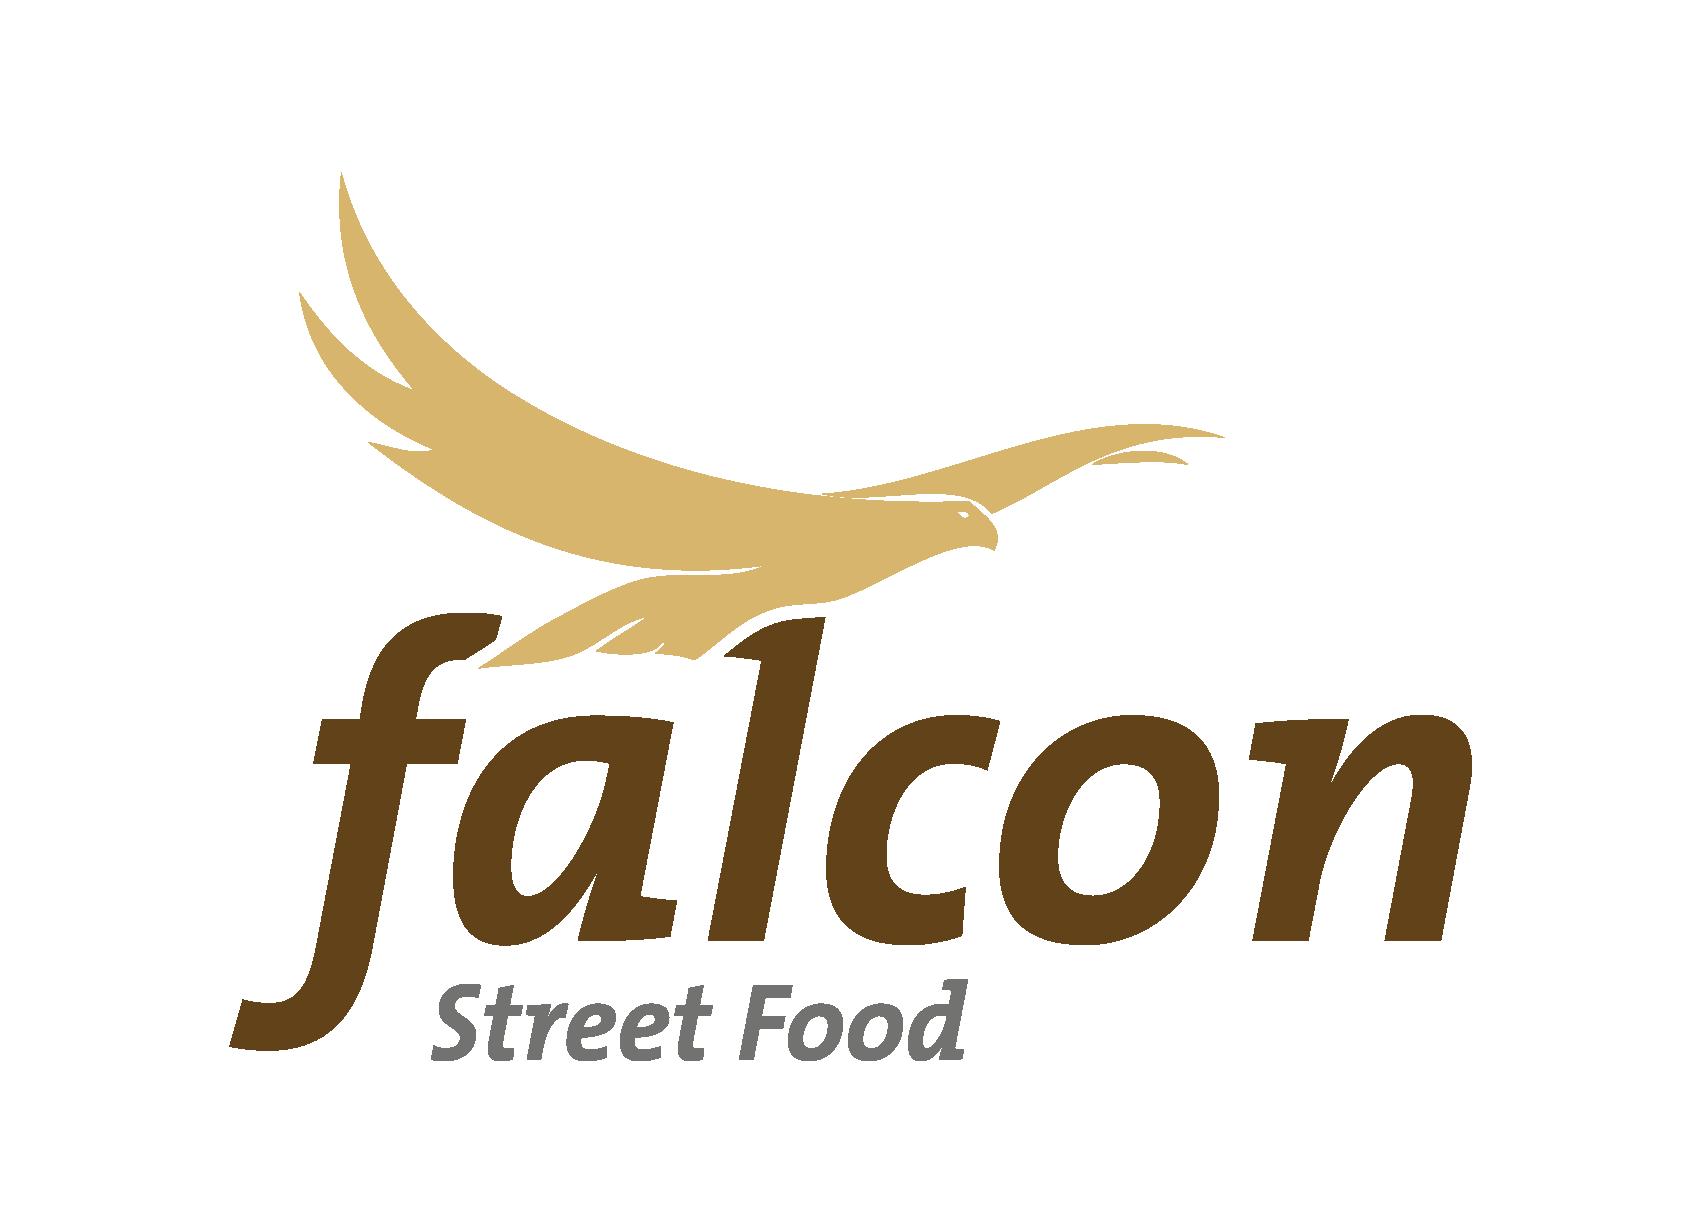 falcon street food - Logo